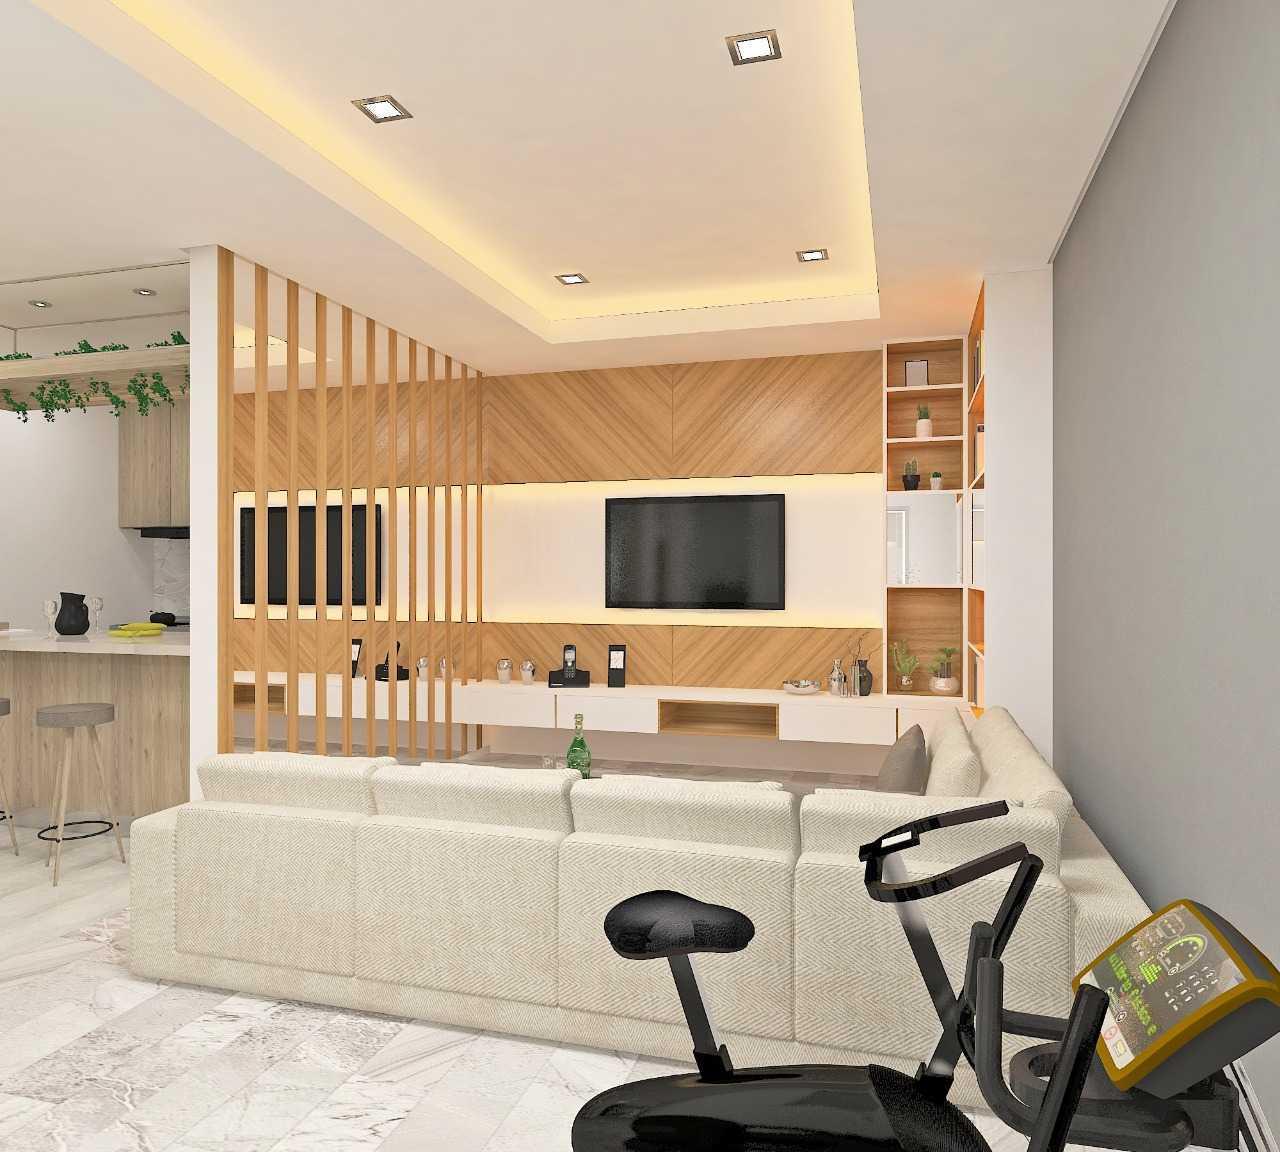 Jasa Design and Build PT.Buana Pratama Interindo di Jawa Barat